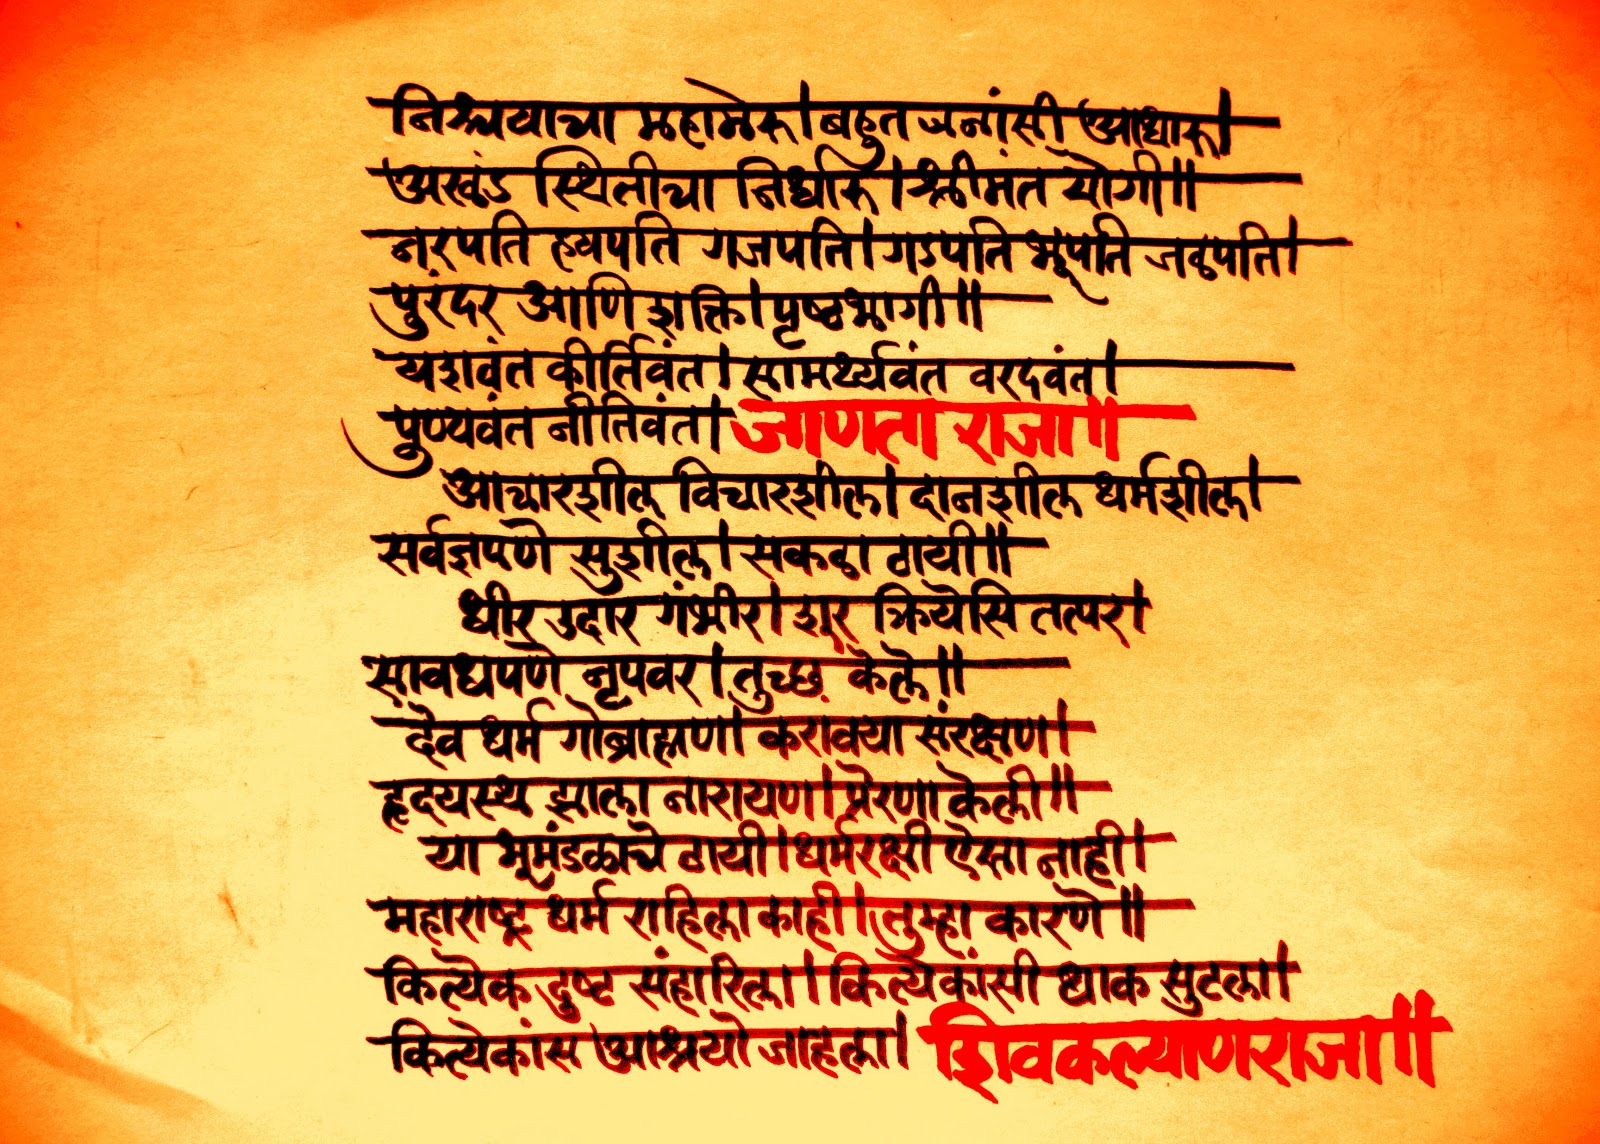 Marathi calligraphy font auto design tech